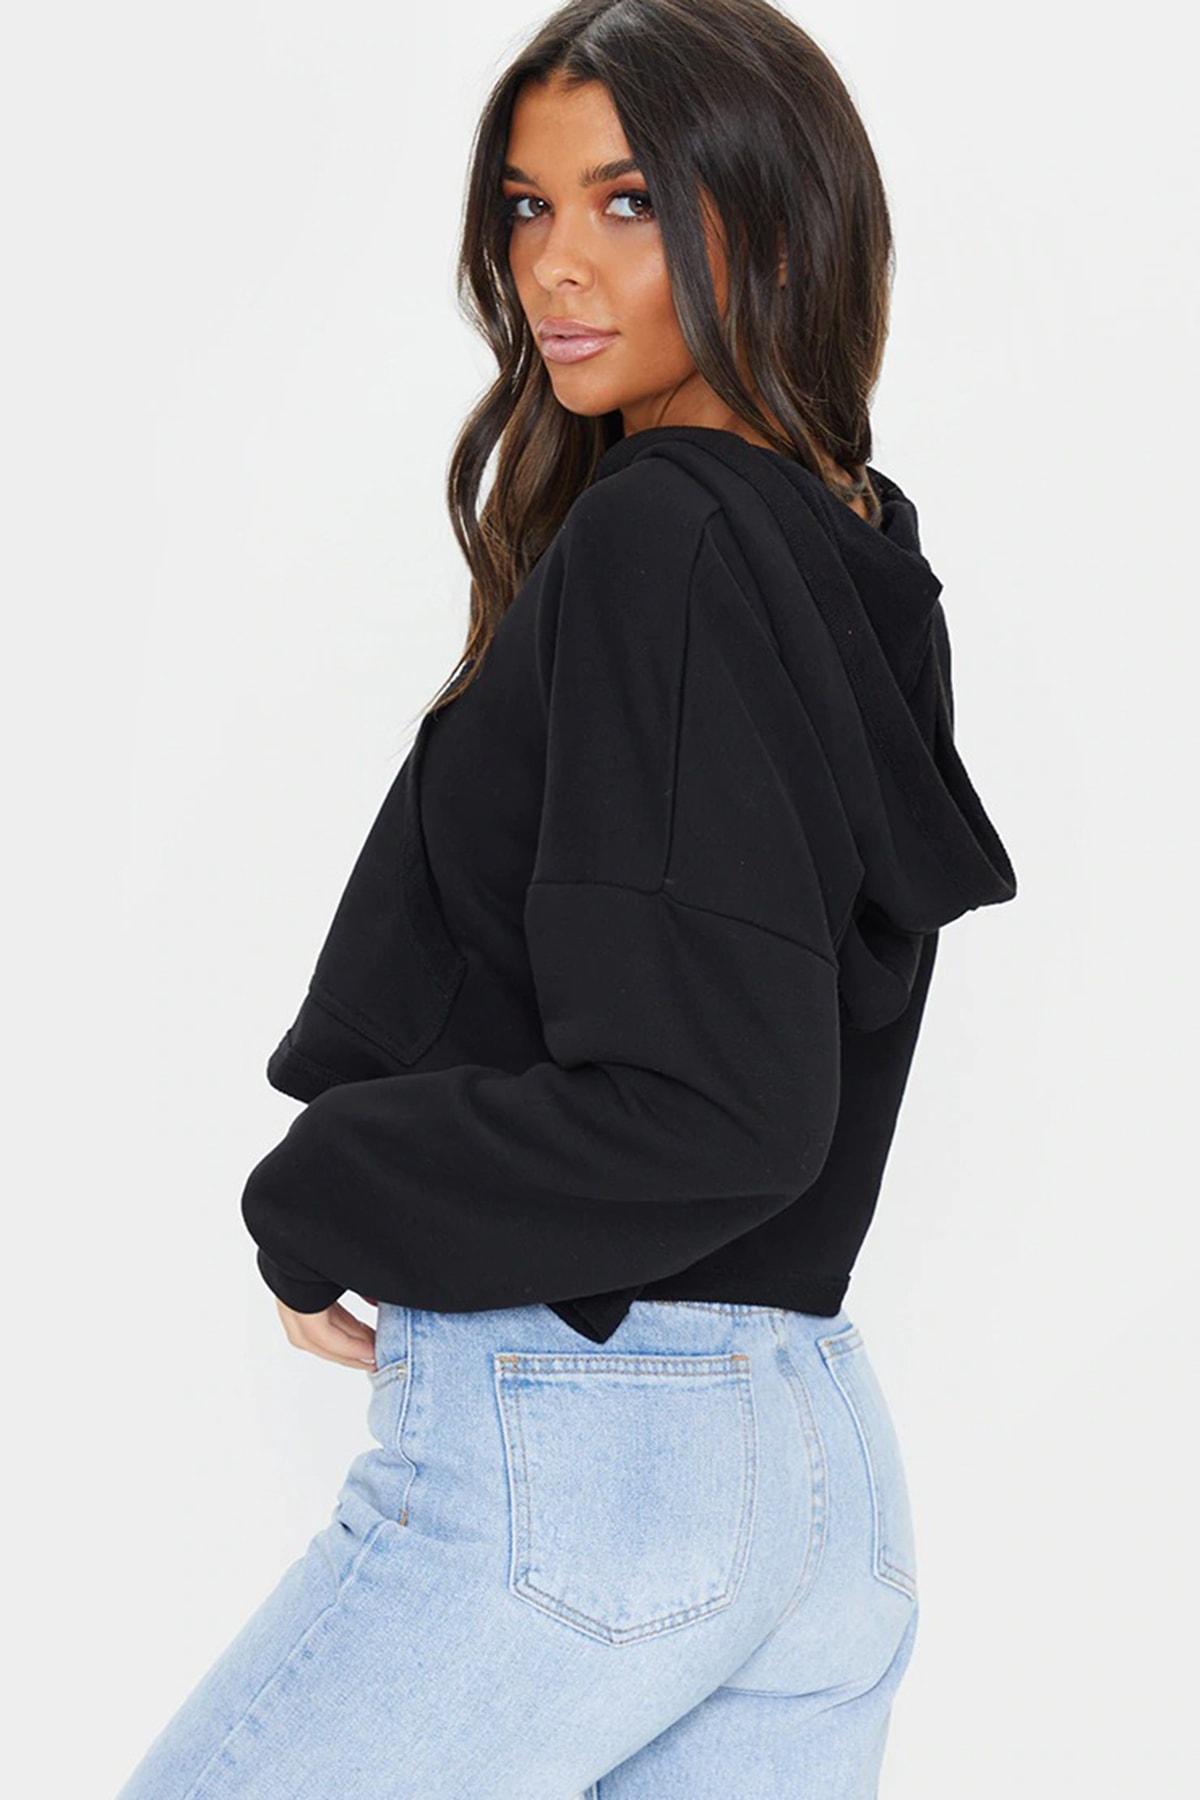 Soufeel Kadın Siyah Crop Kısa V Yaka Kapüşonlu Sweatshirt